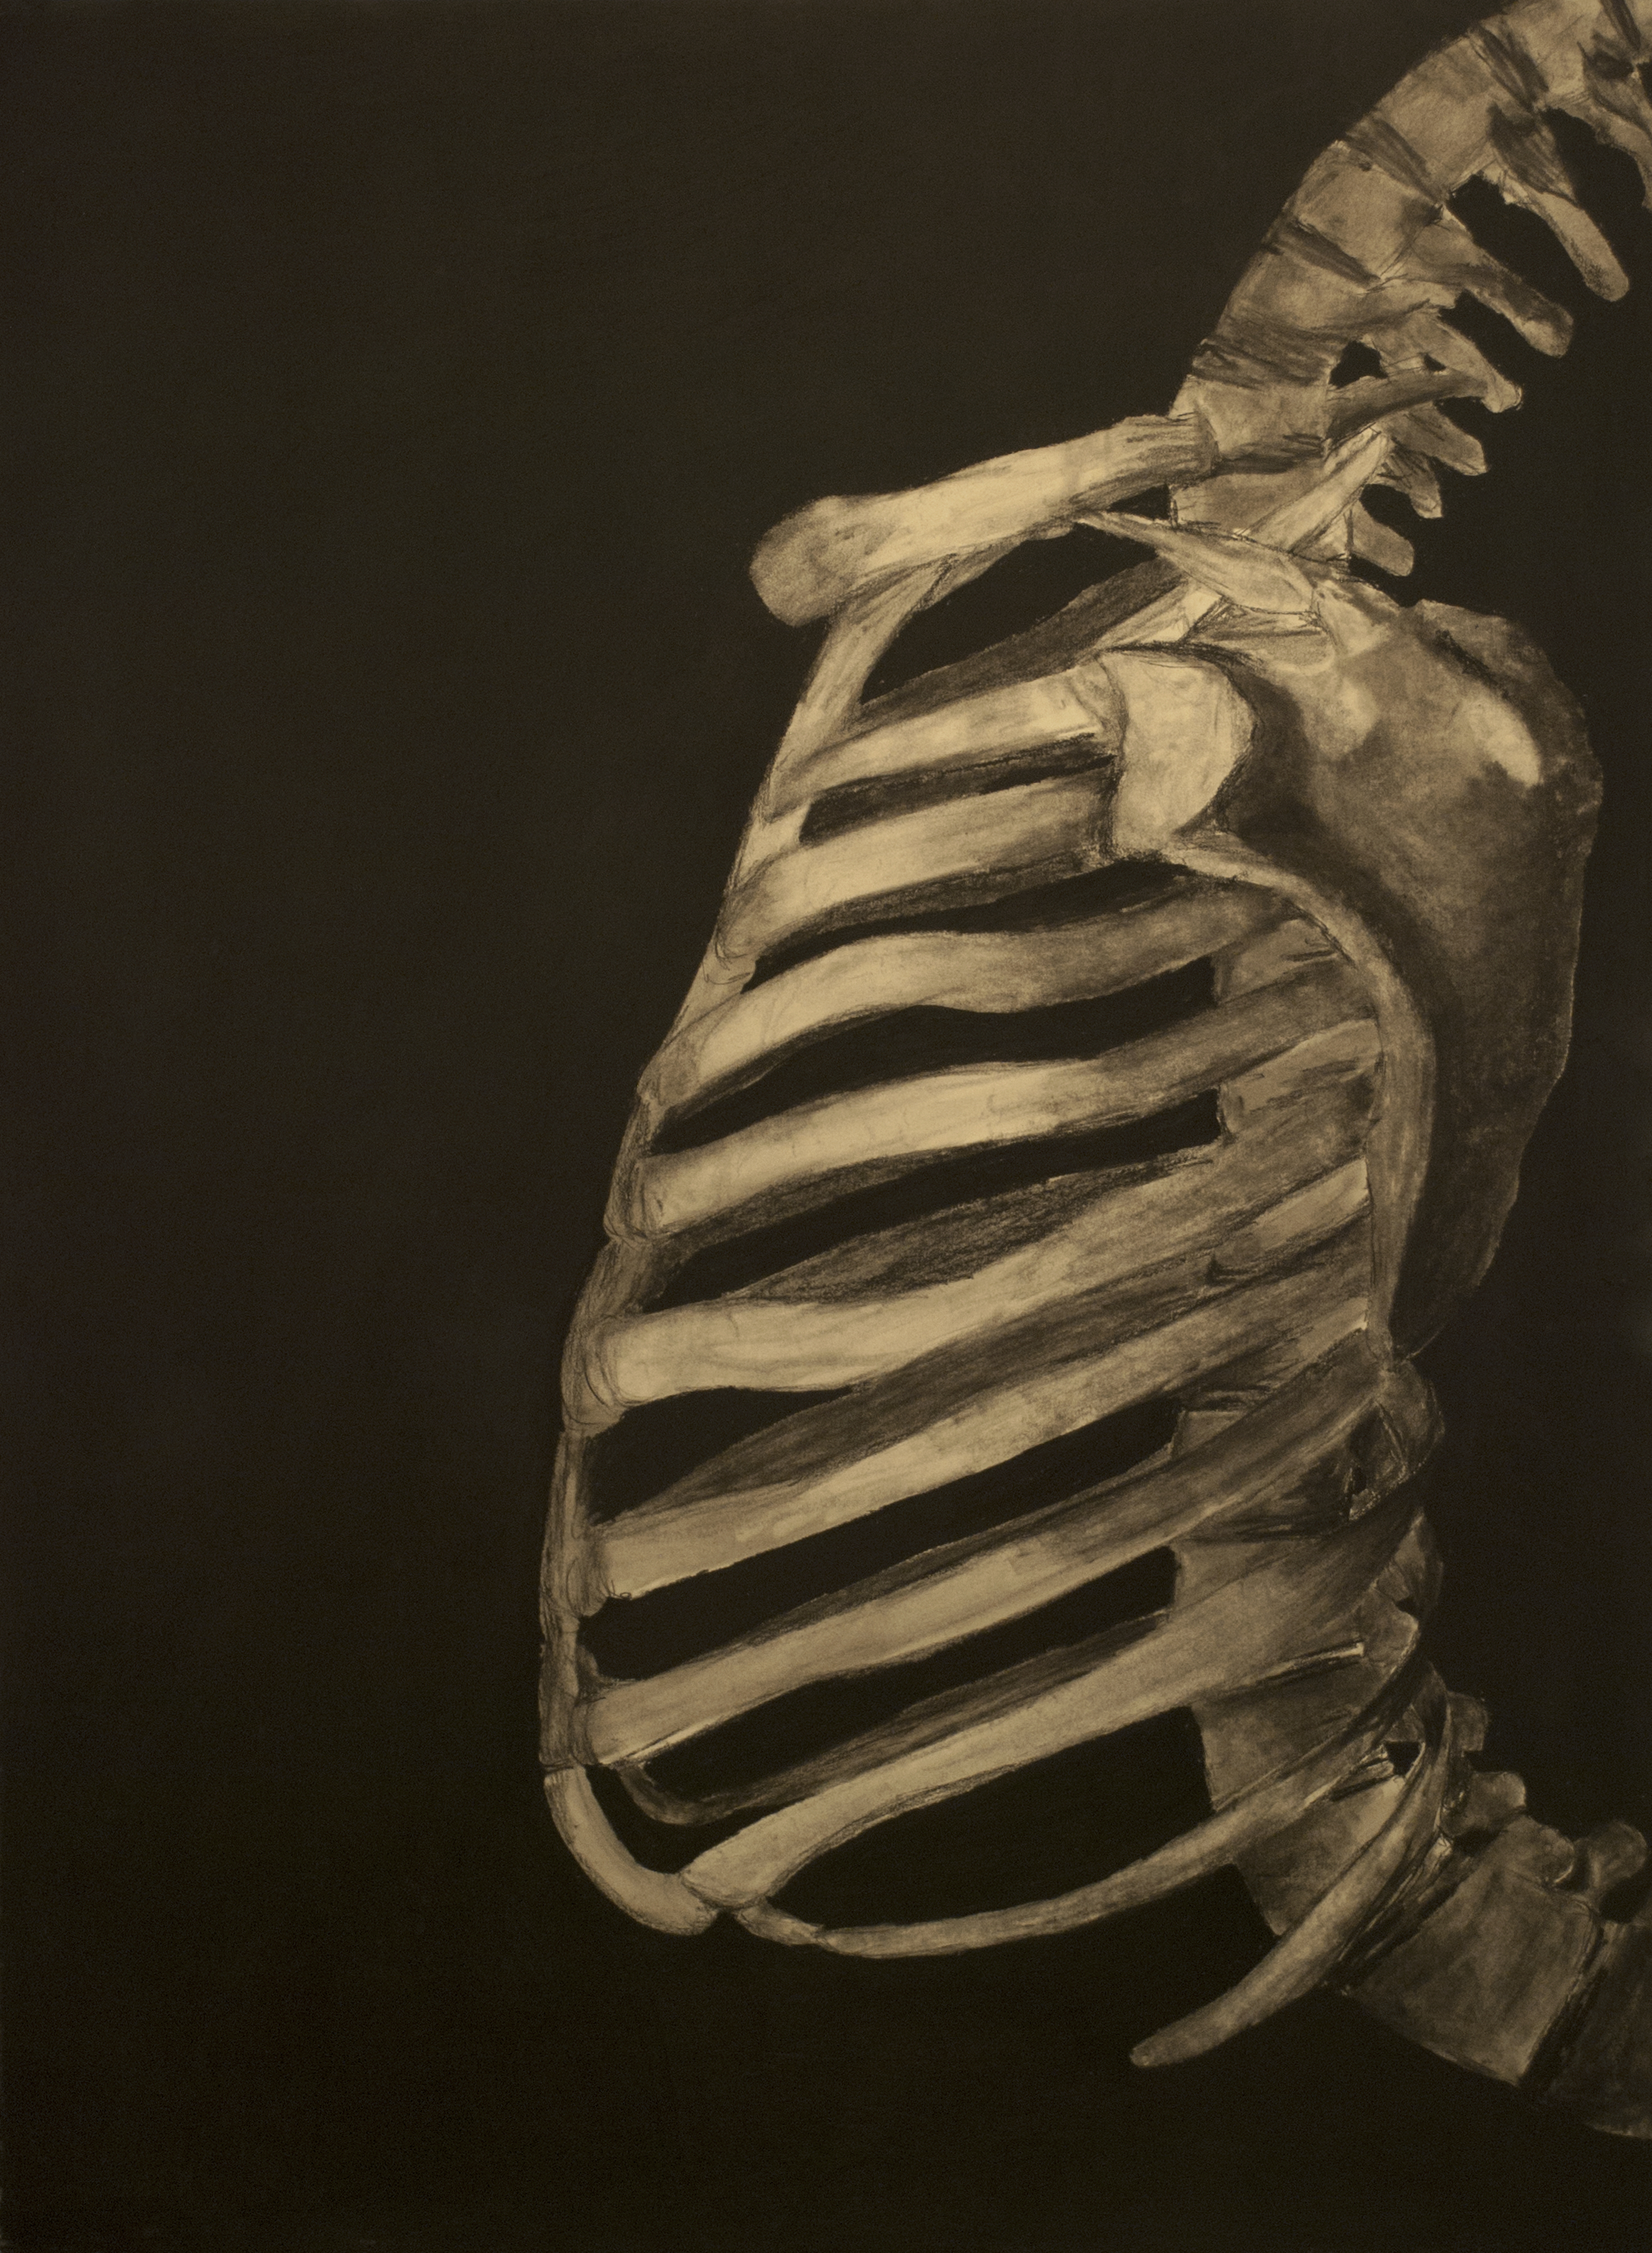 """Crunch (a ribcage study)"""